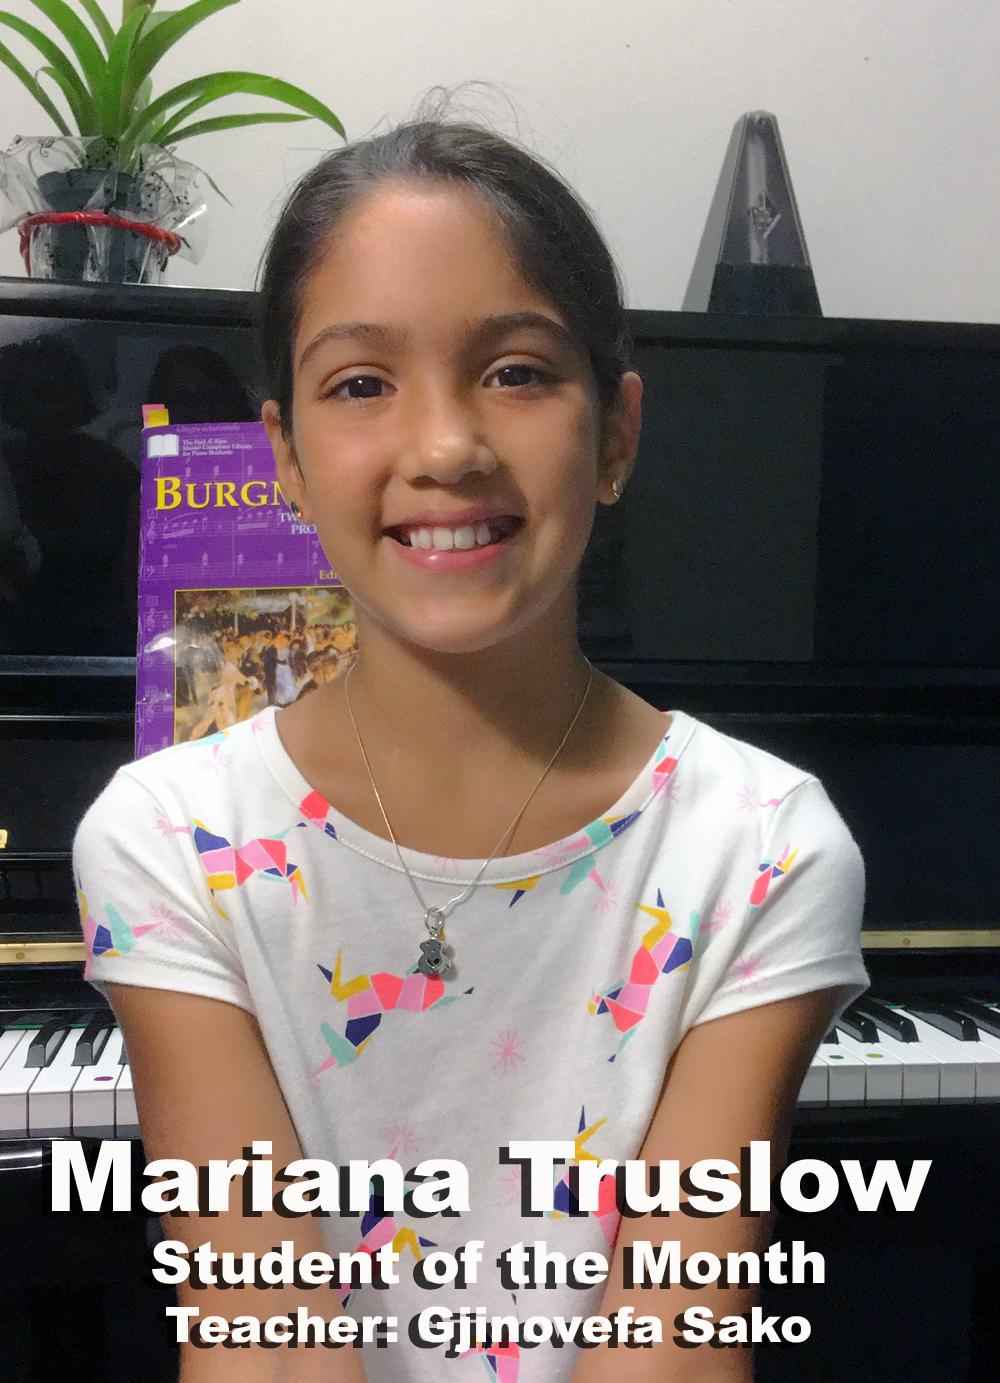 mariana truslow (1).jpg